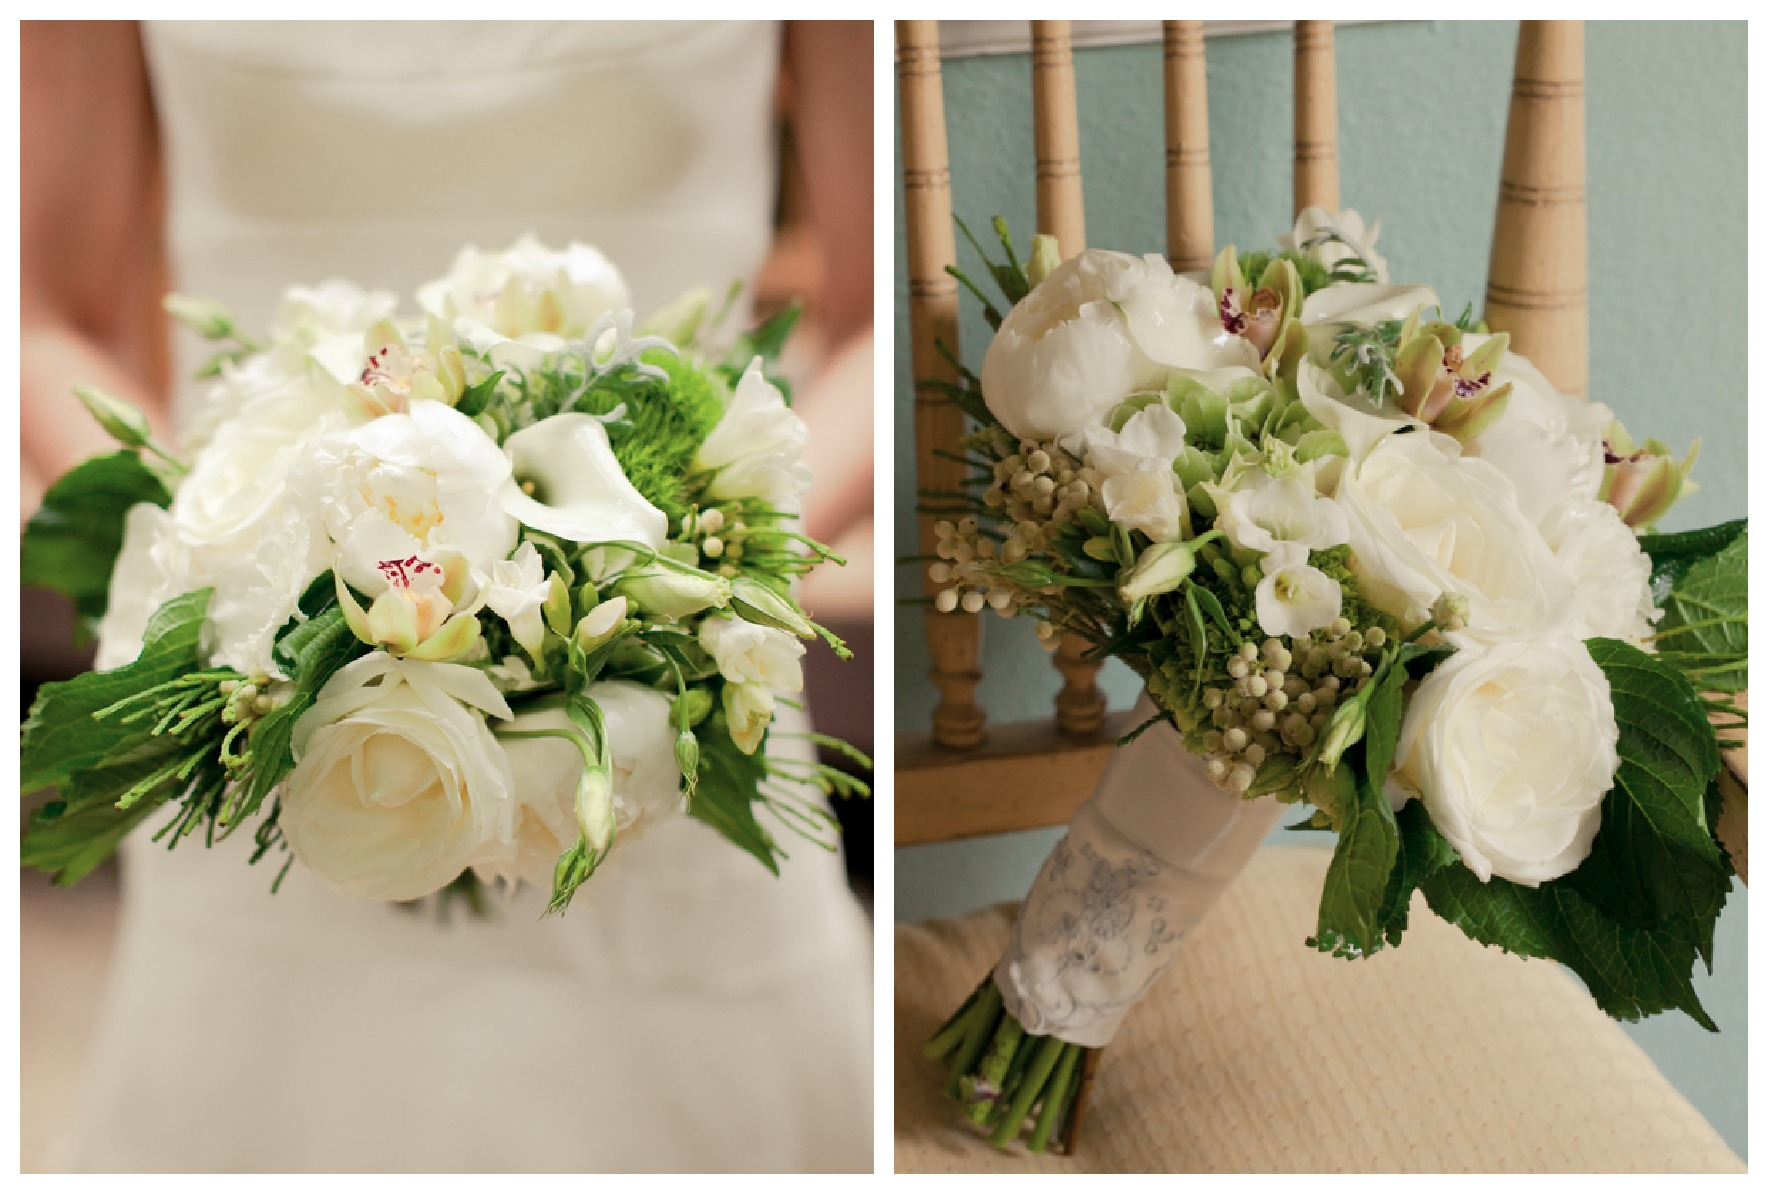 Rusticwweddingchic White Amp Green Bridal Bouquet